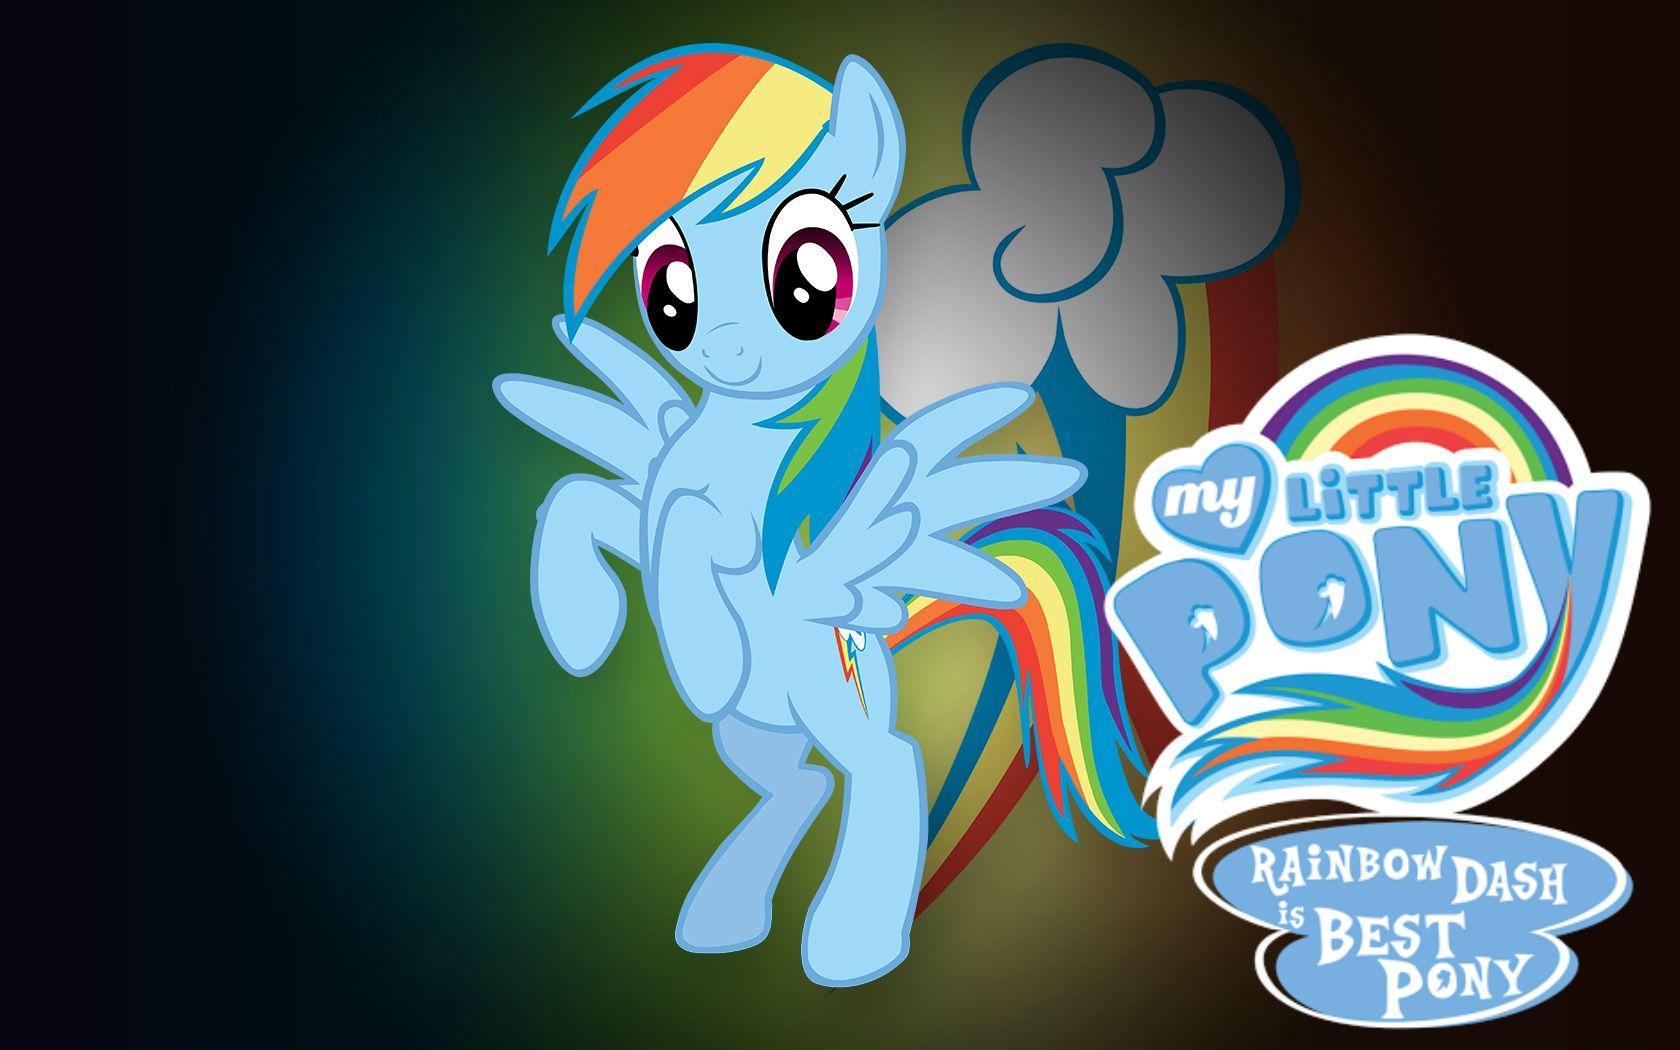 rainbow dash cool mlp my little pony friendship is